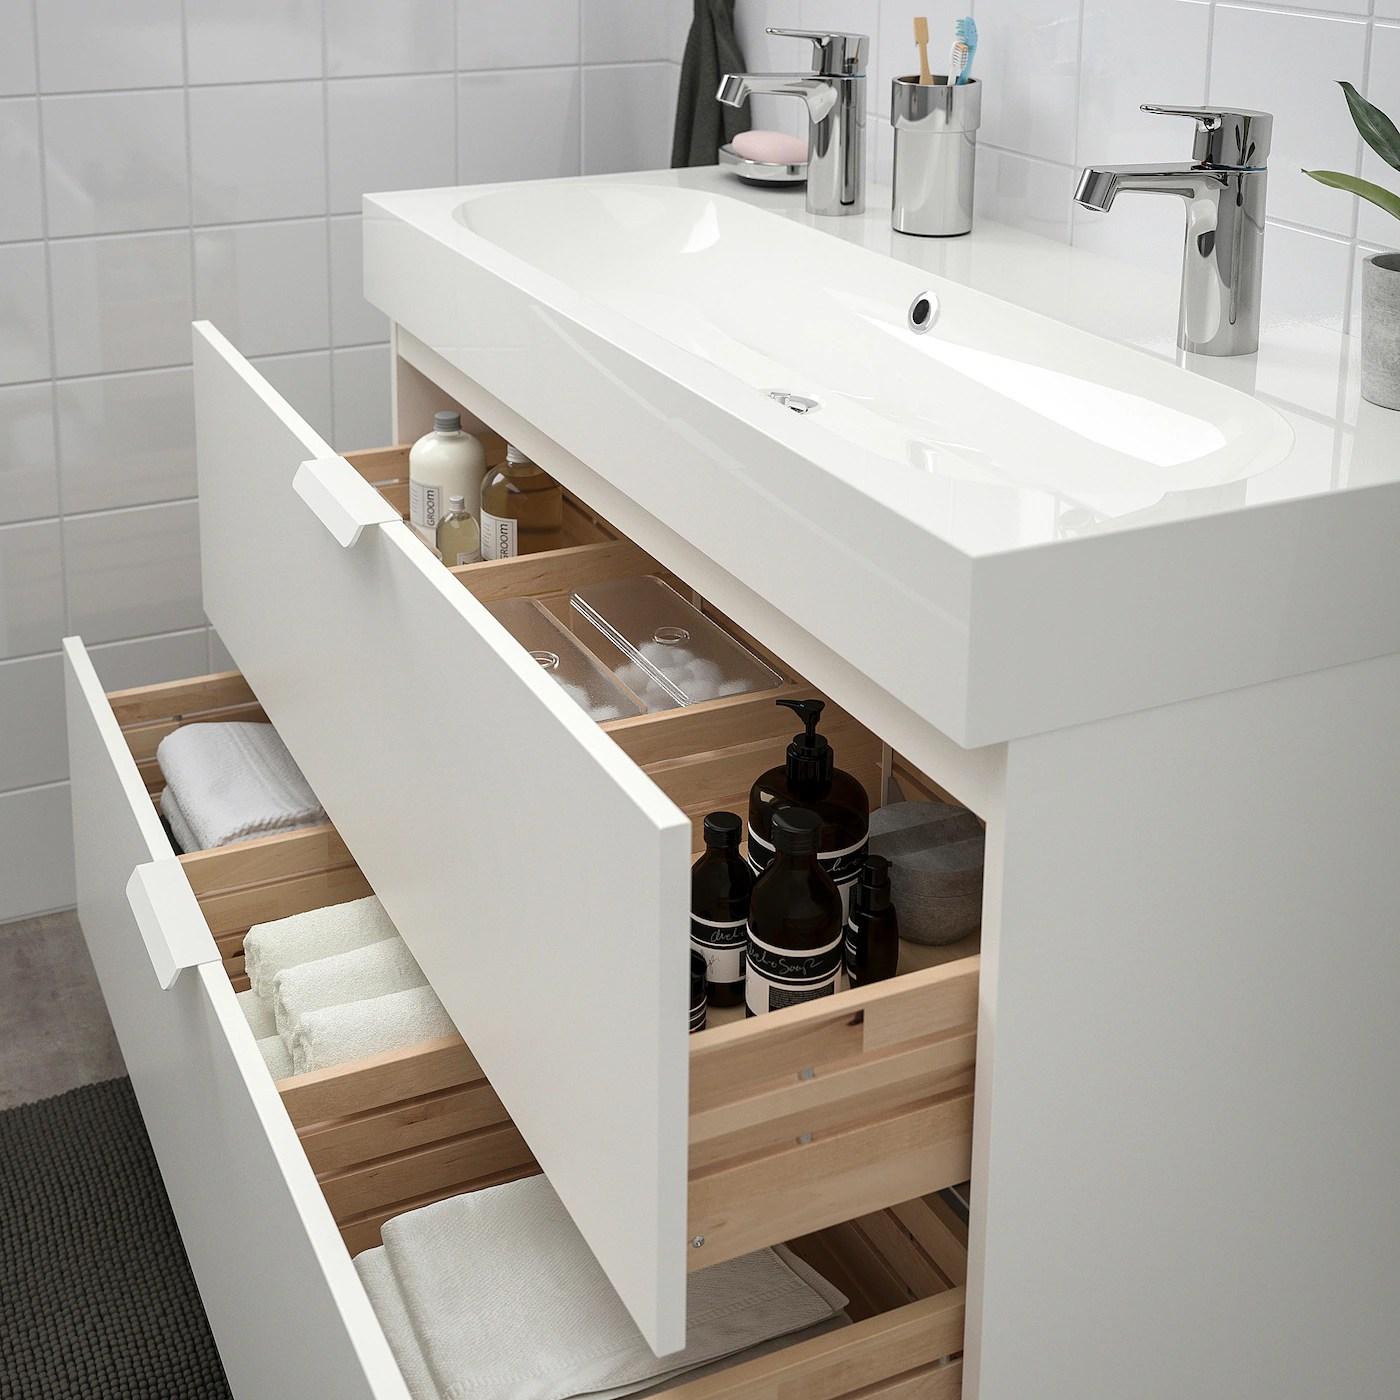 godmorgon braviken meuble lavabo 2tir blanc mitigeur lavabo brogrund 100x48x68 cm